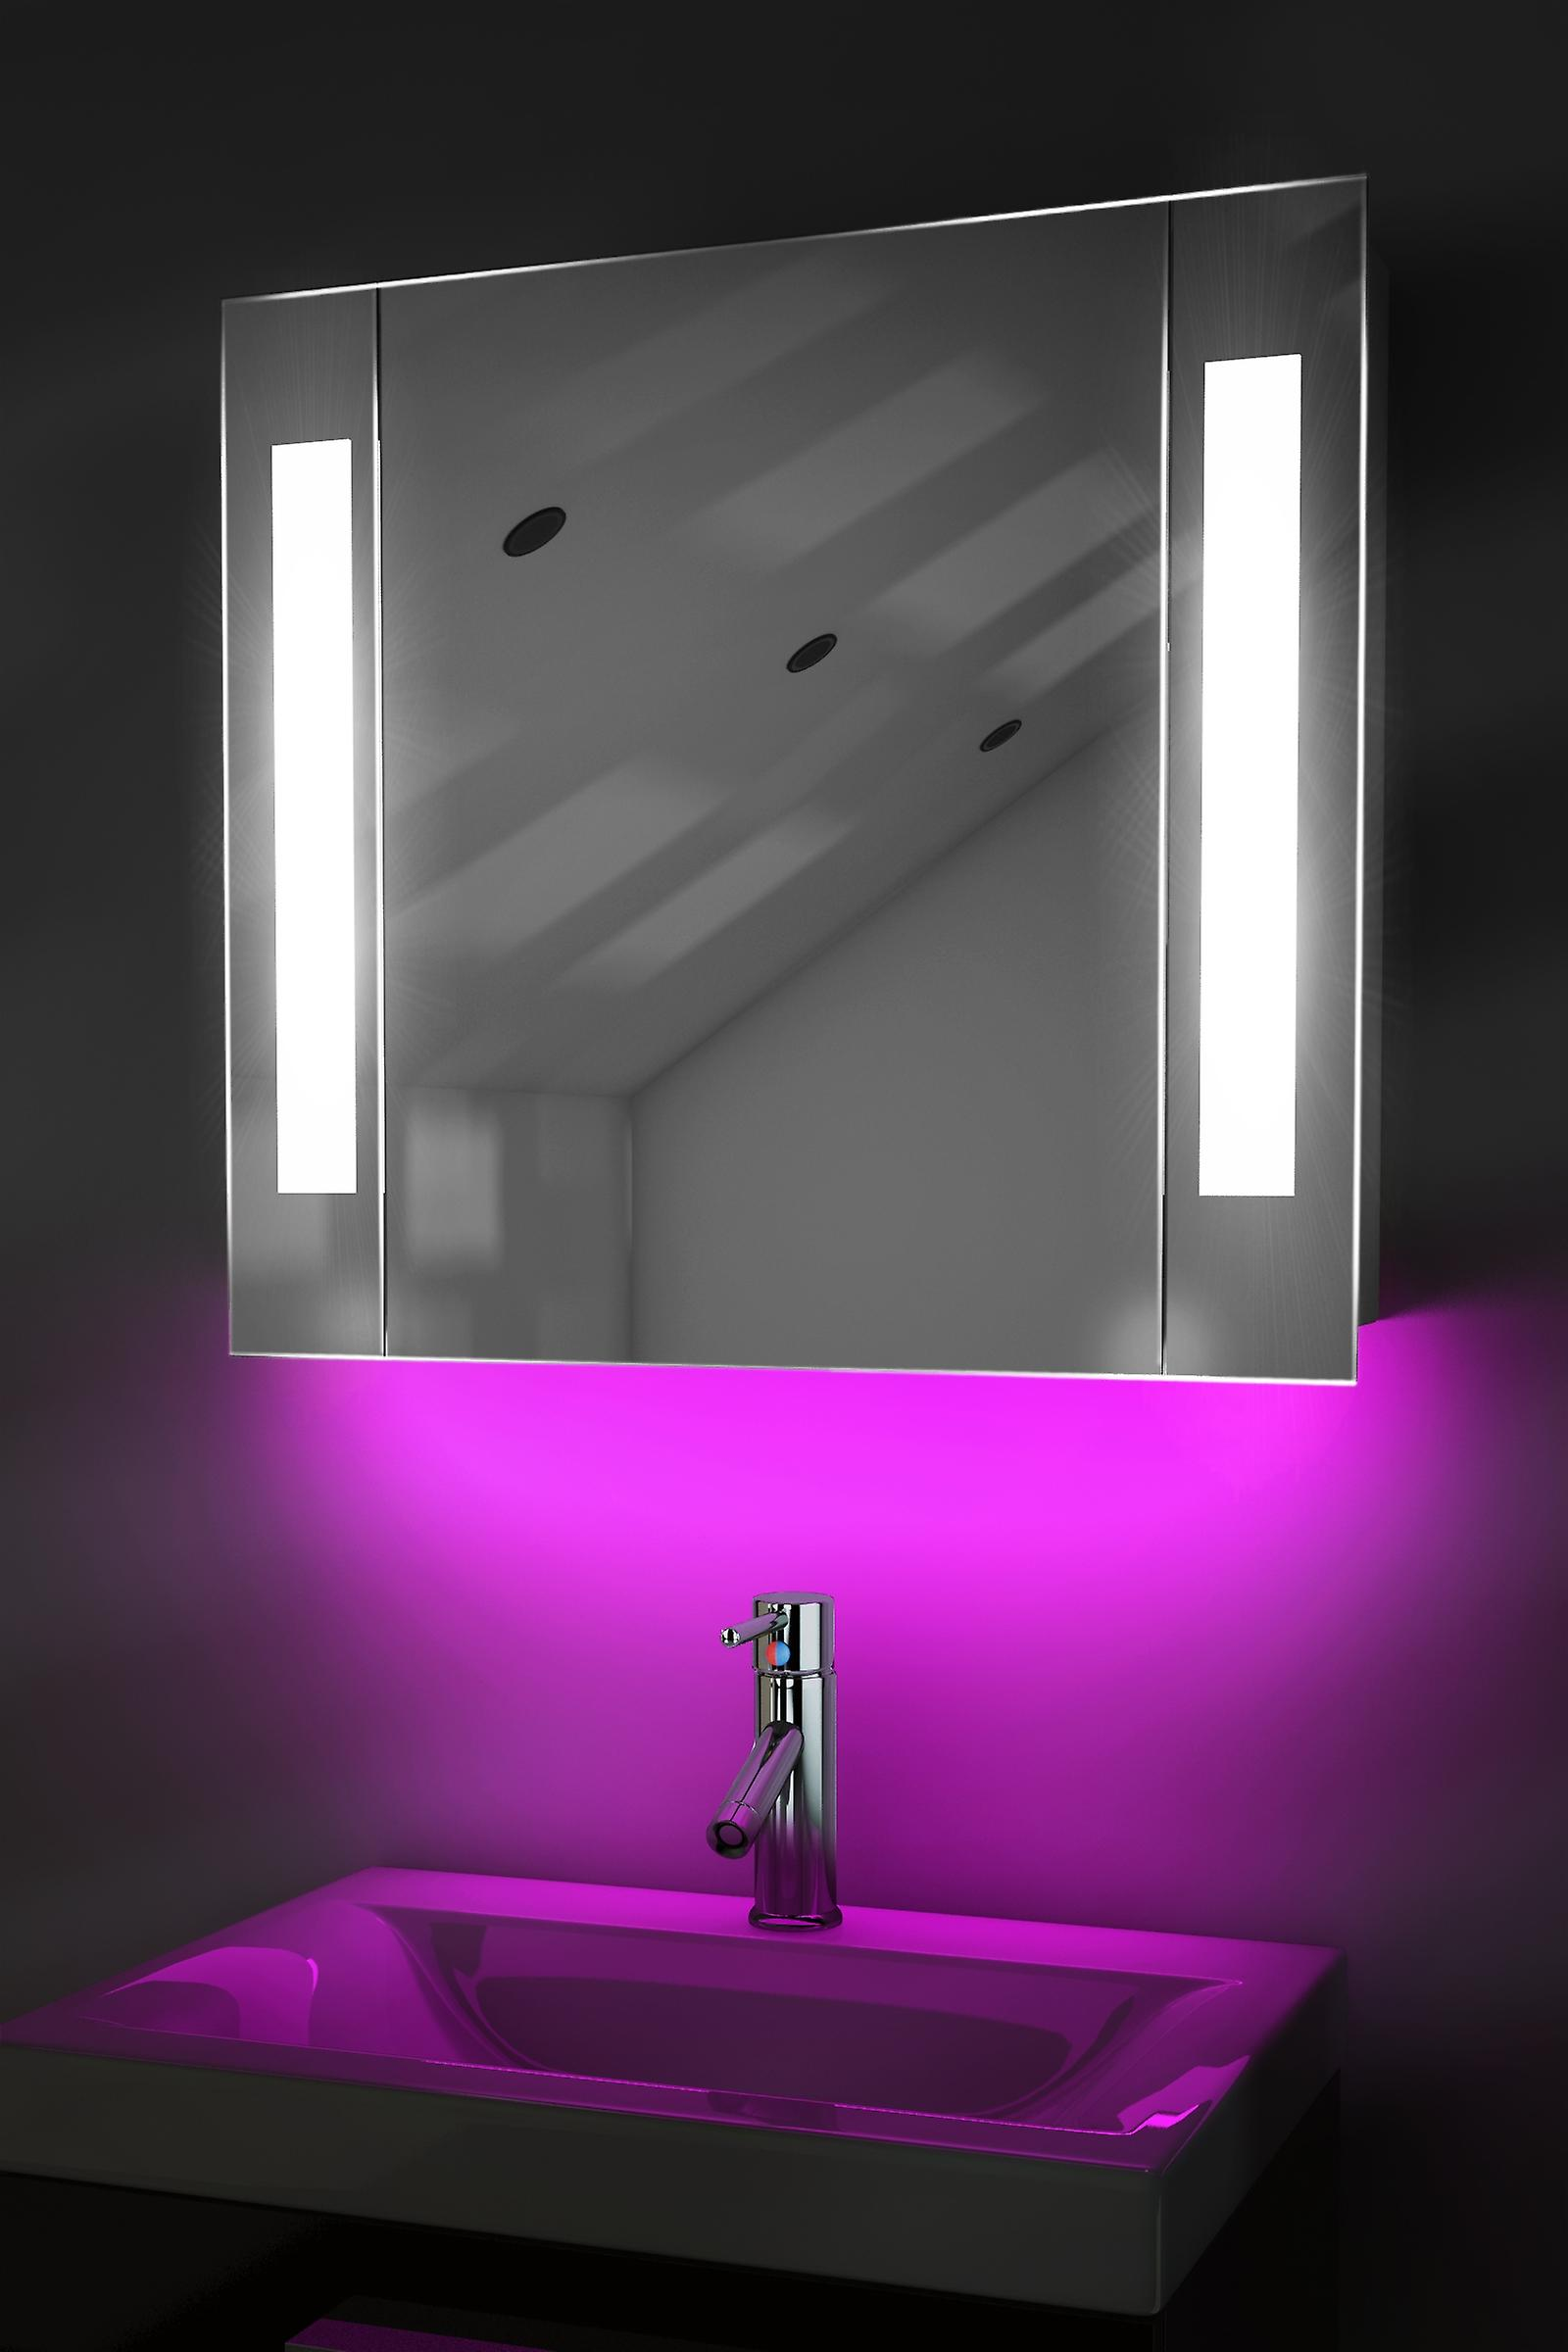 Ambient Audio Bathroom Cabinet With Bluetooth, Shaver & Sensor K17aud